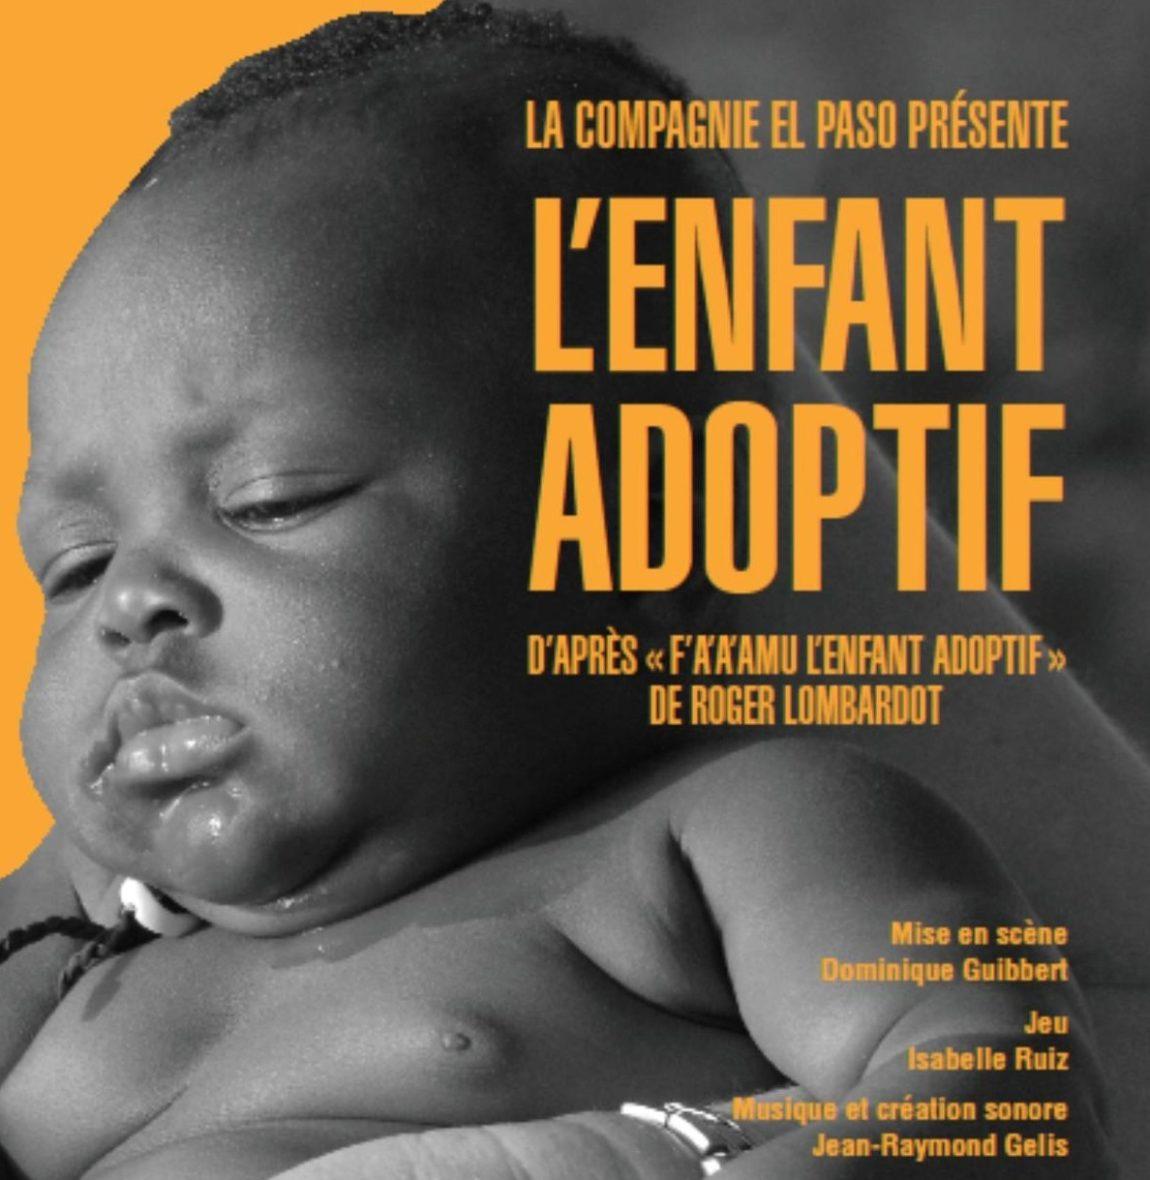 [REPORTÉ] FA'A'AMU, l'enfant adoptif